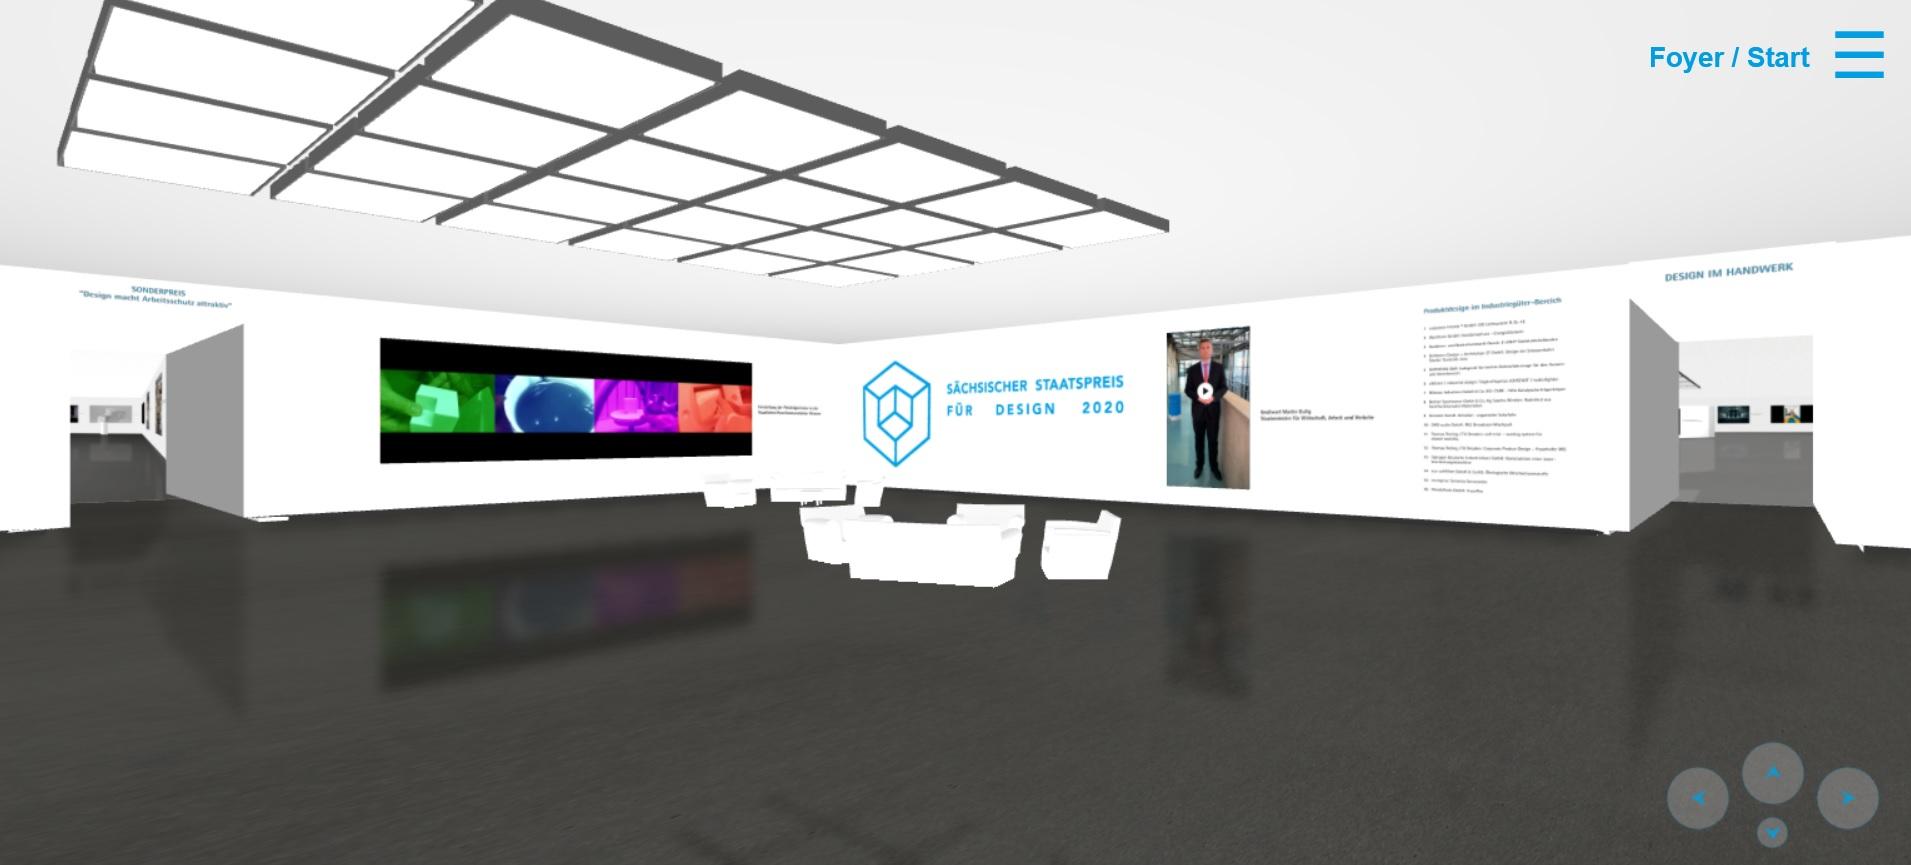 Designpreis_virtuelle Ausstellung